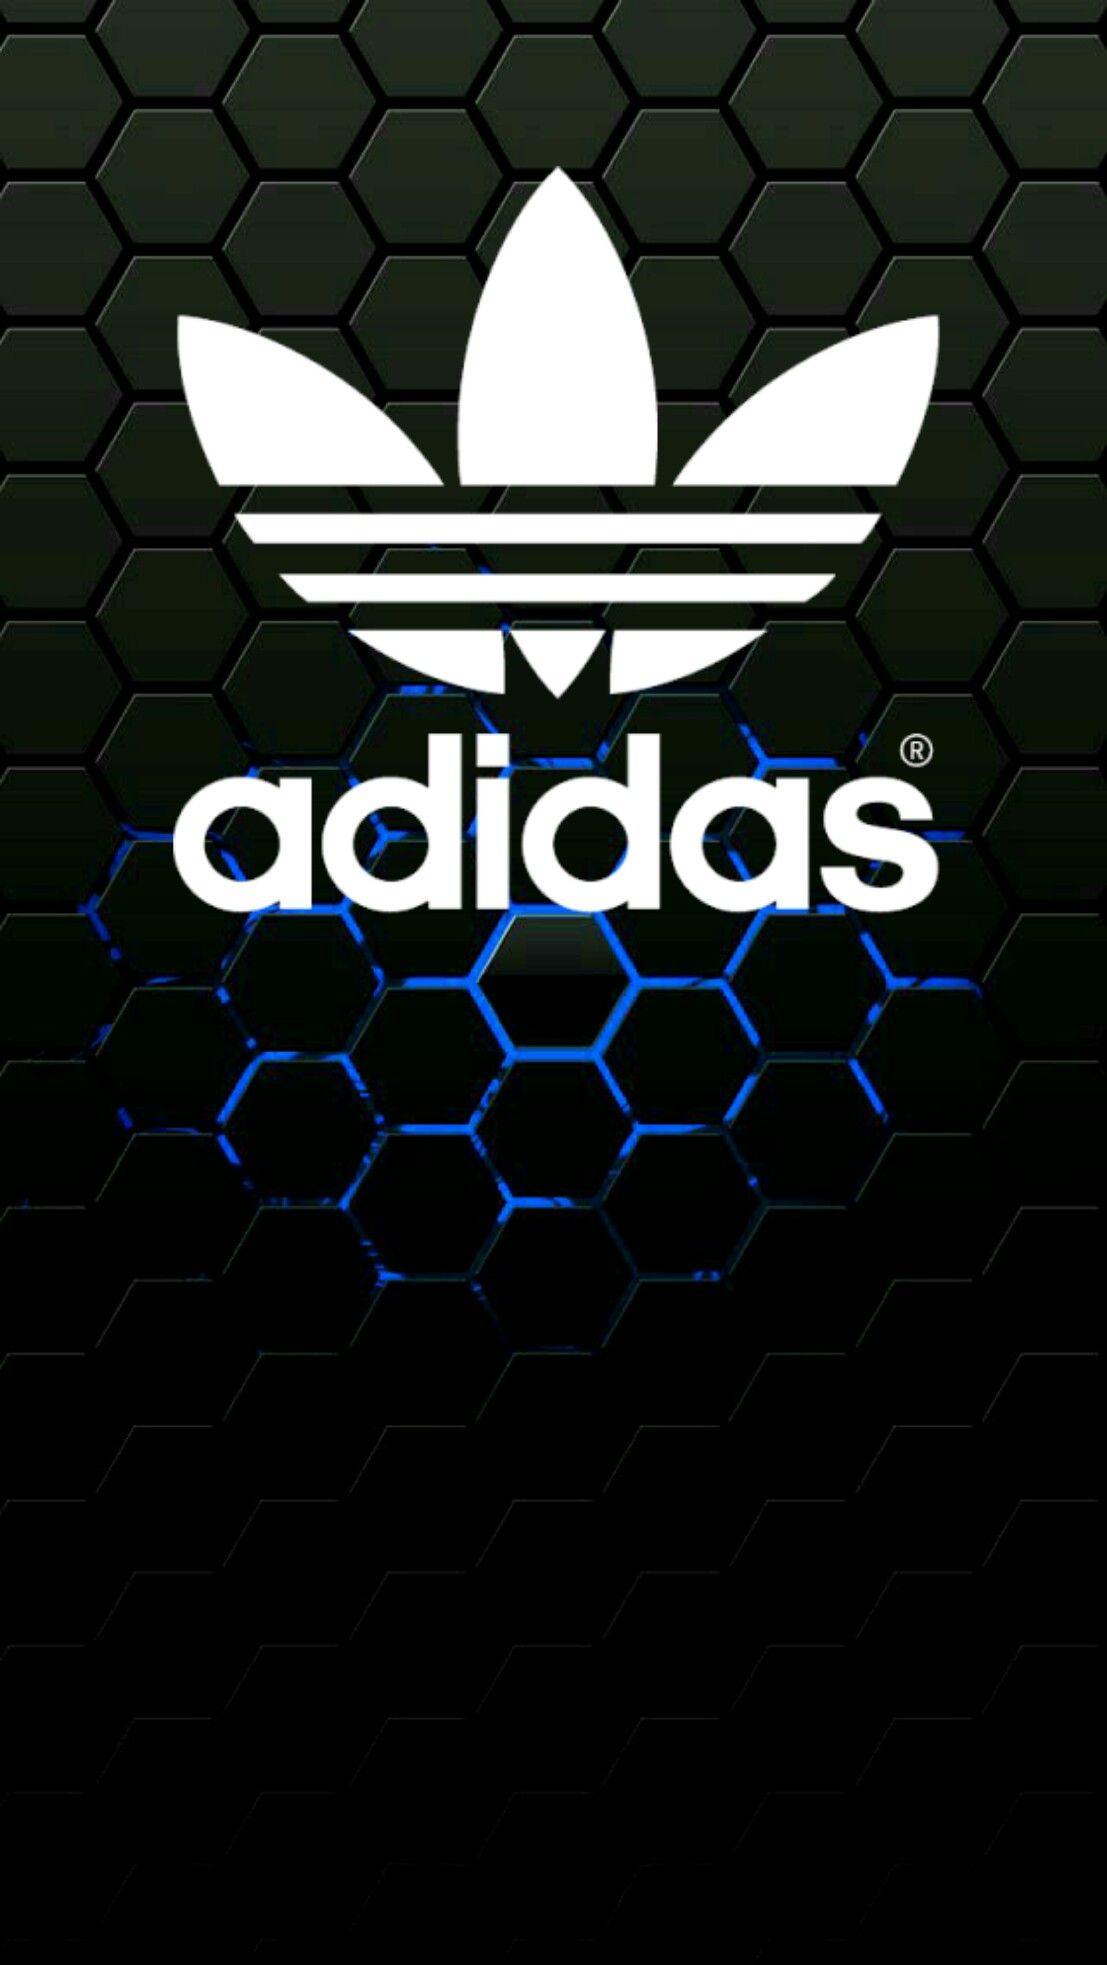 Adidas nero sfondo androide iphone futeball pinterest